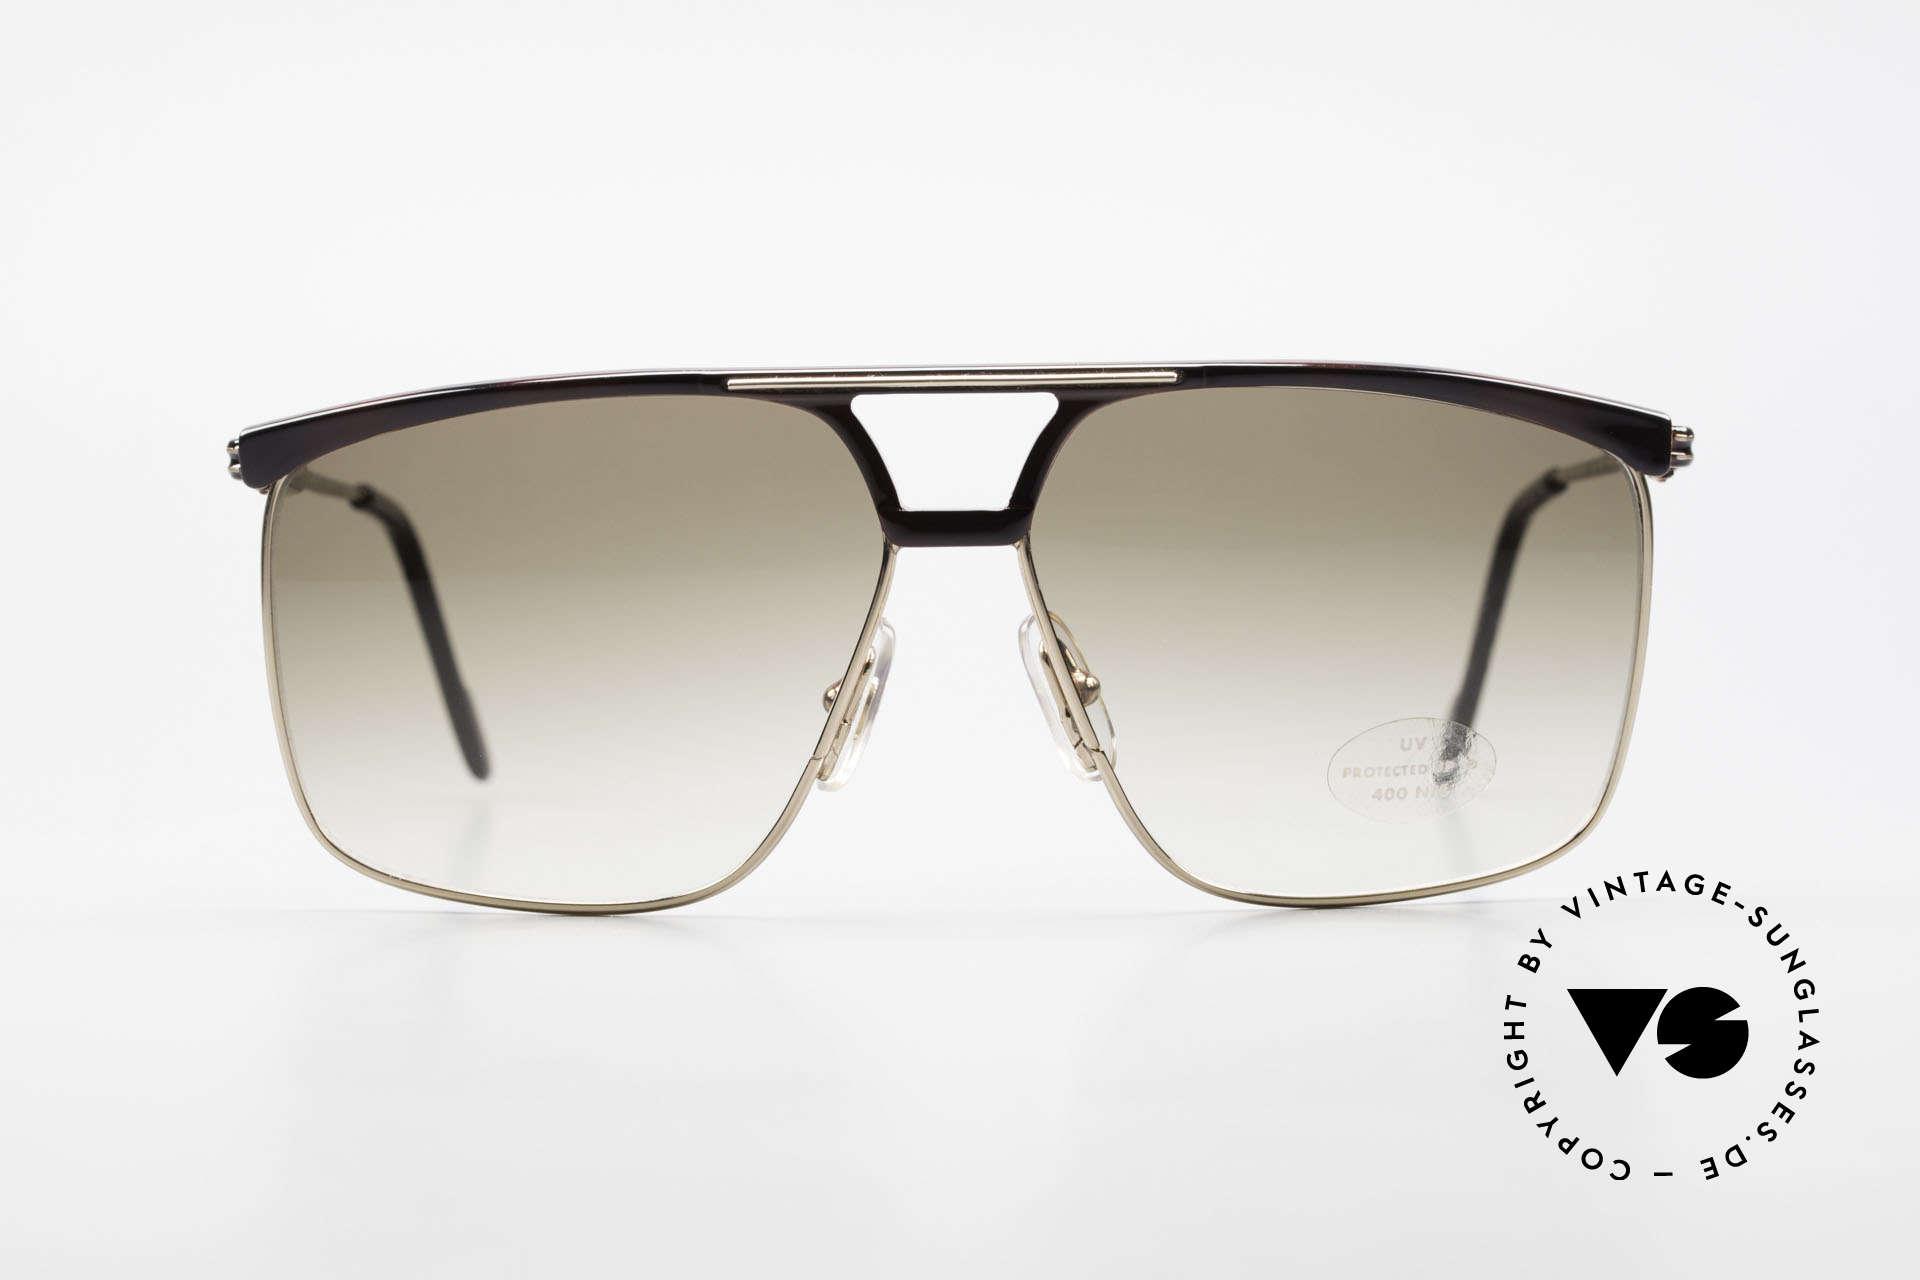 Ferrari F35 Alutanium Sunglasses X-Large, finest quality & superior frame finishing; true vintage, Made for Men